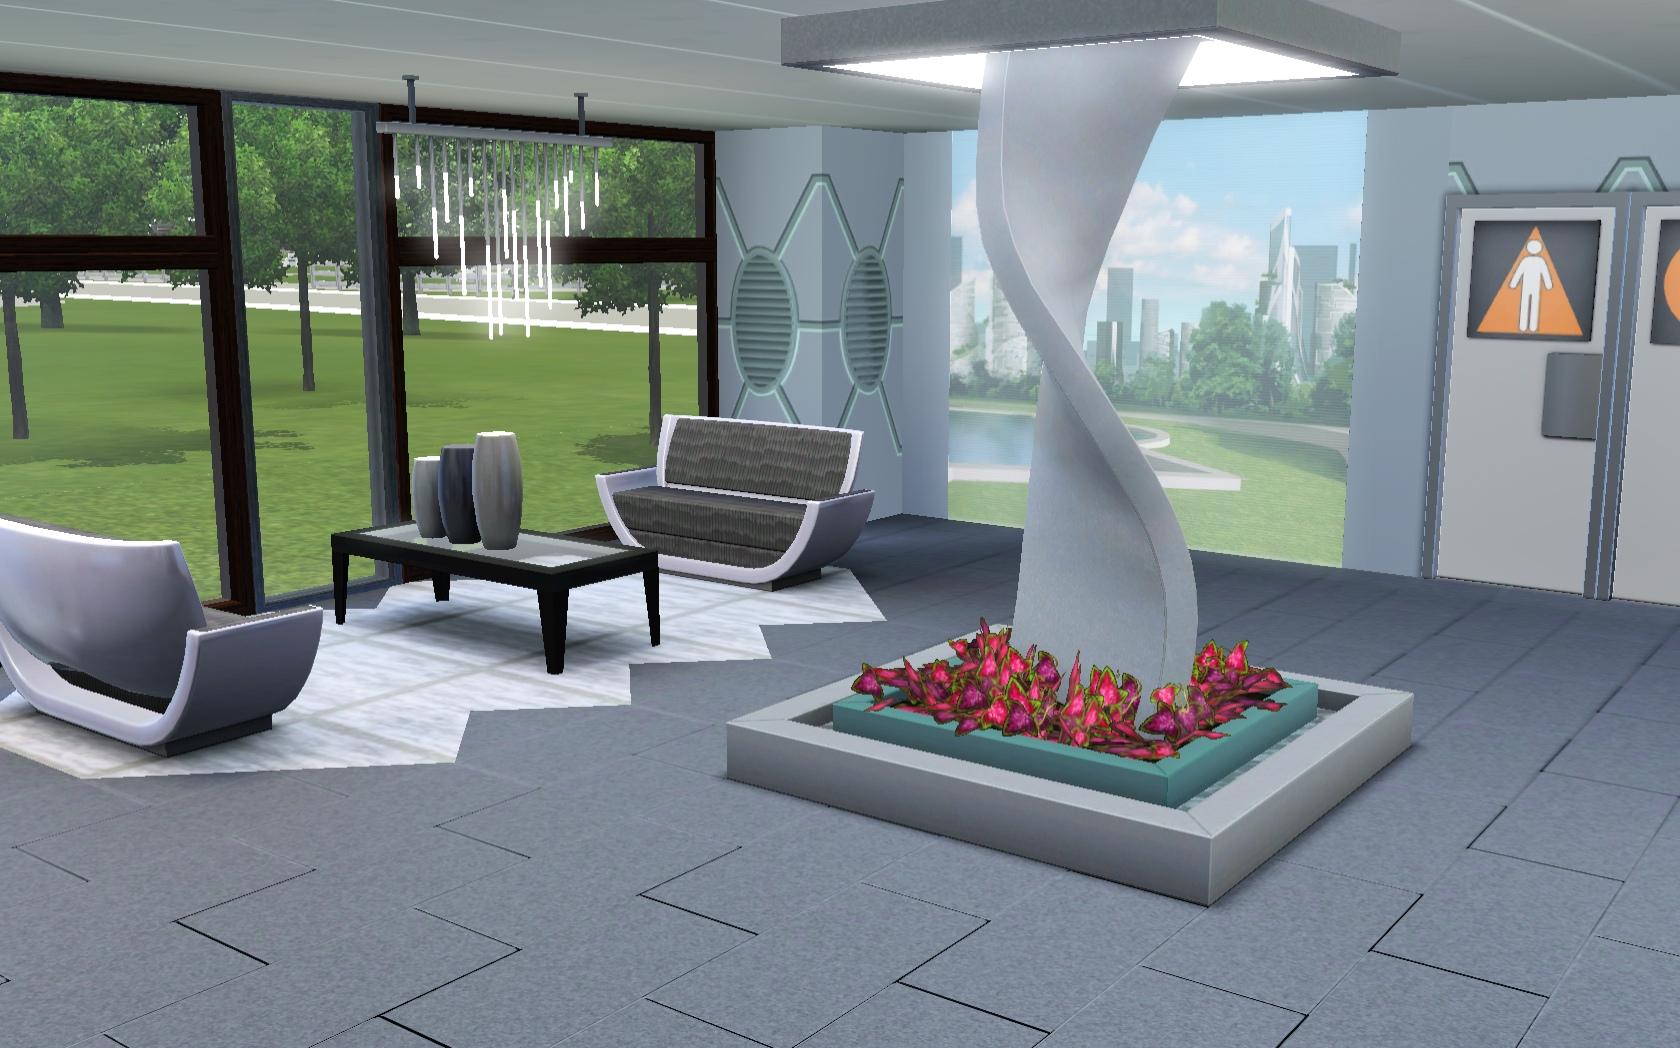 Sims 4 Cc Furniture Sets